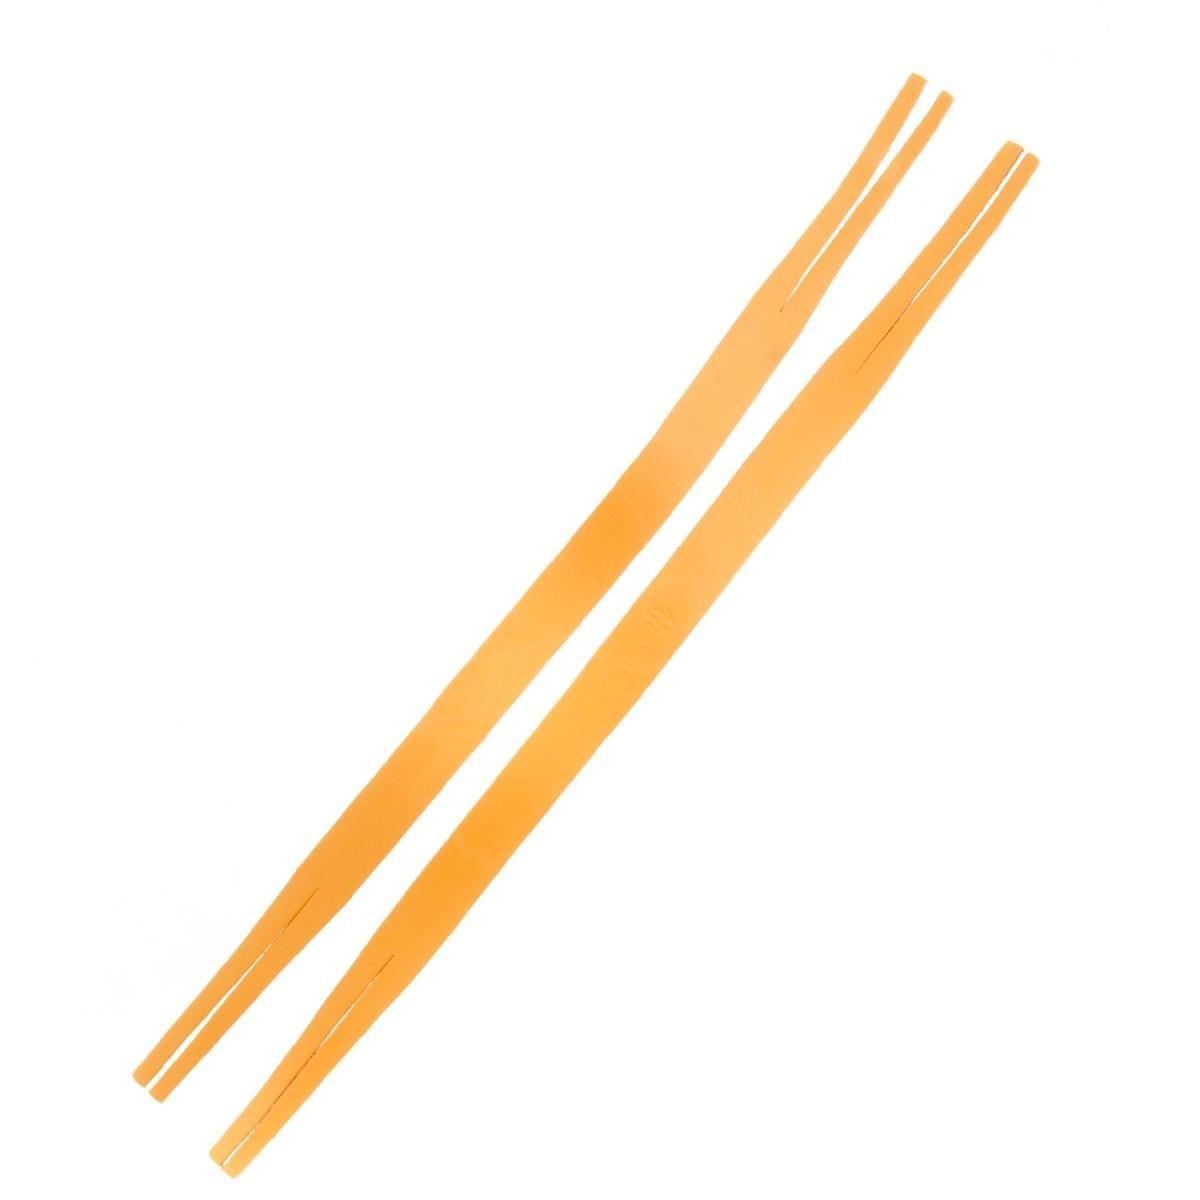 Manili piatti Honsuy in pelle beige